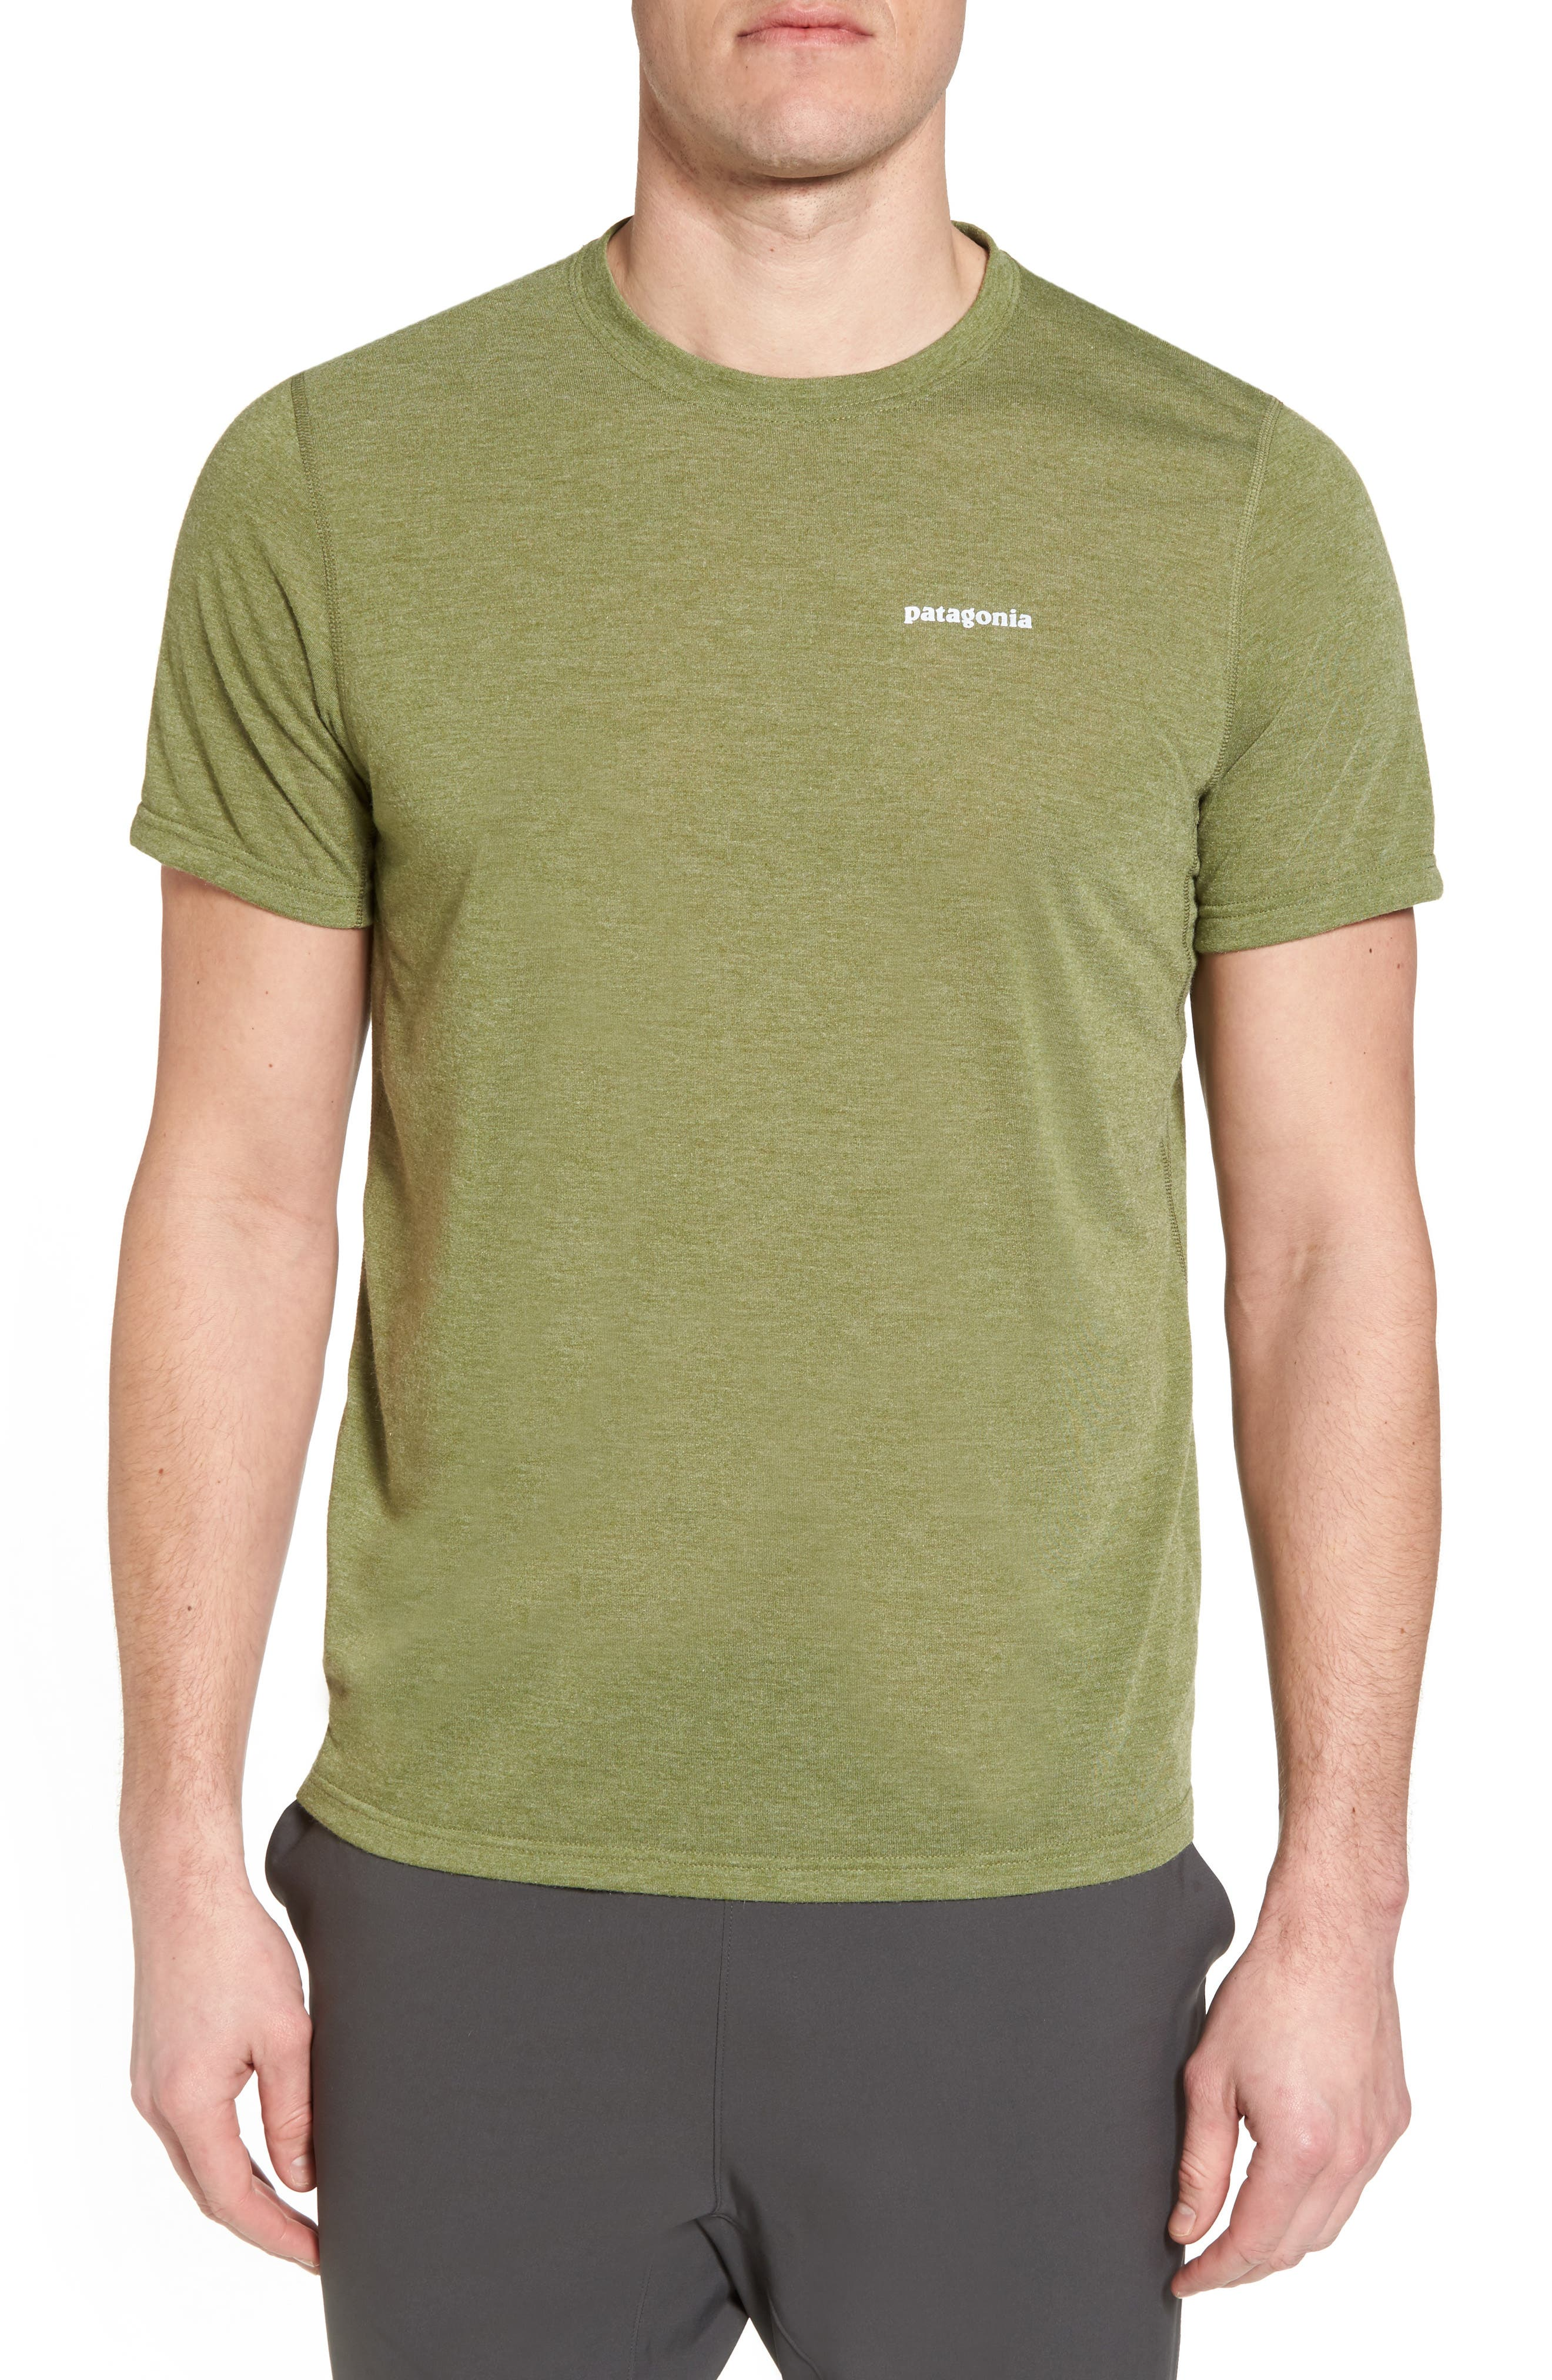 Patagonia Nine Trails Crewneck T-Shirt